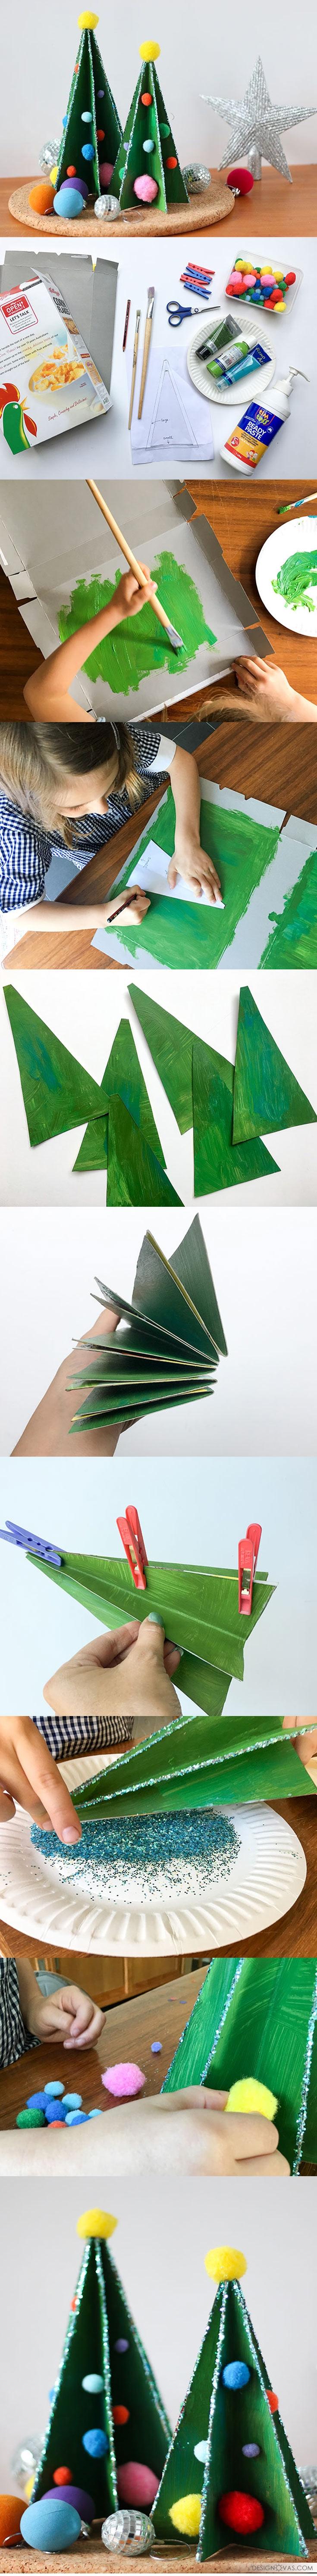 01-xmas-crafts